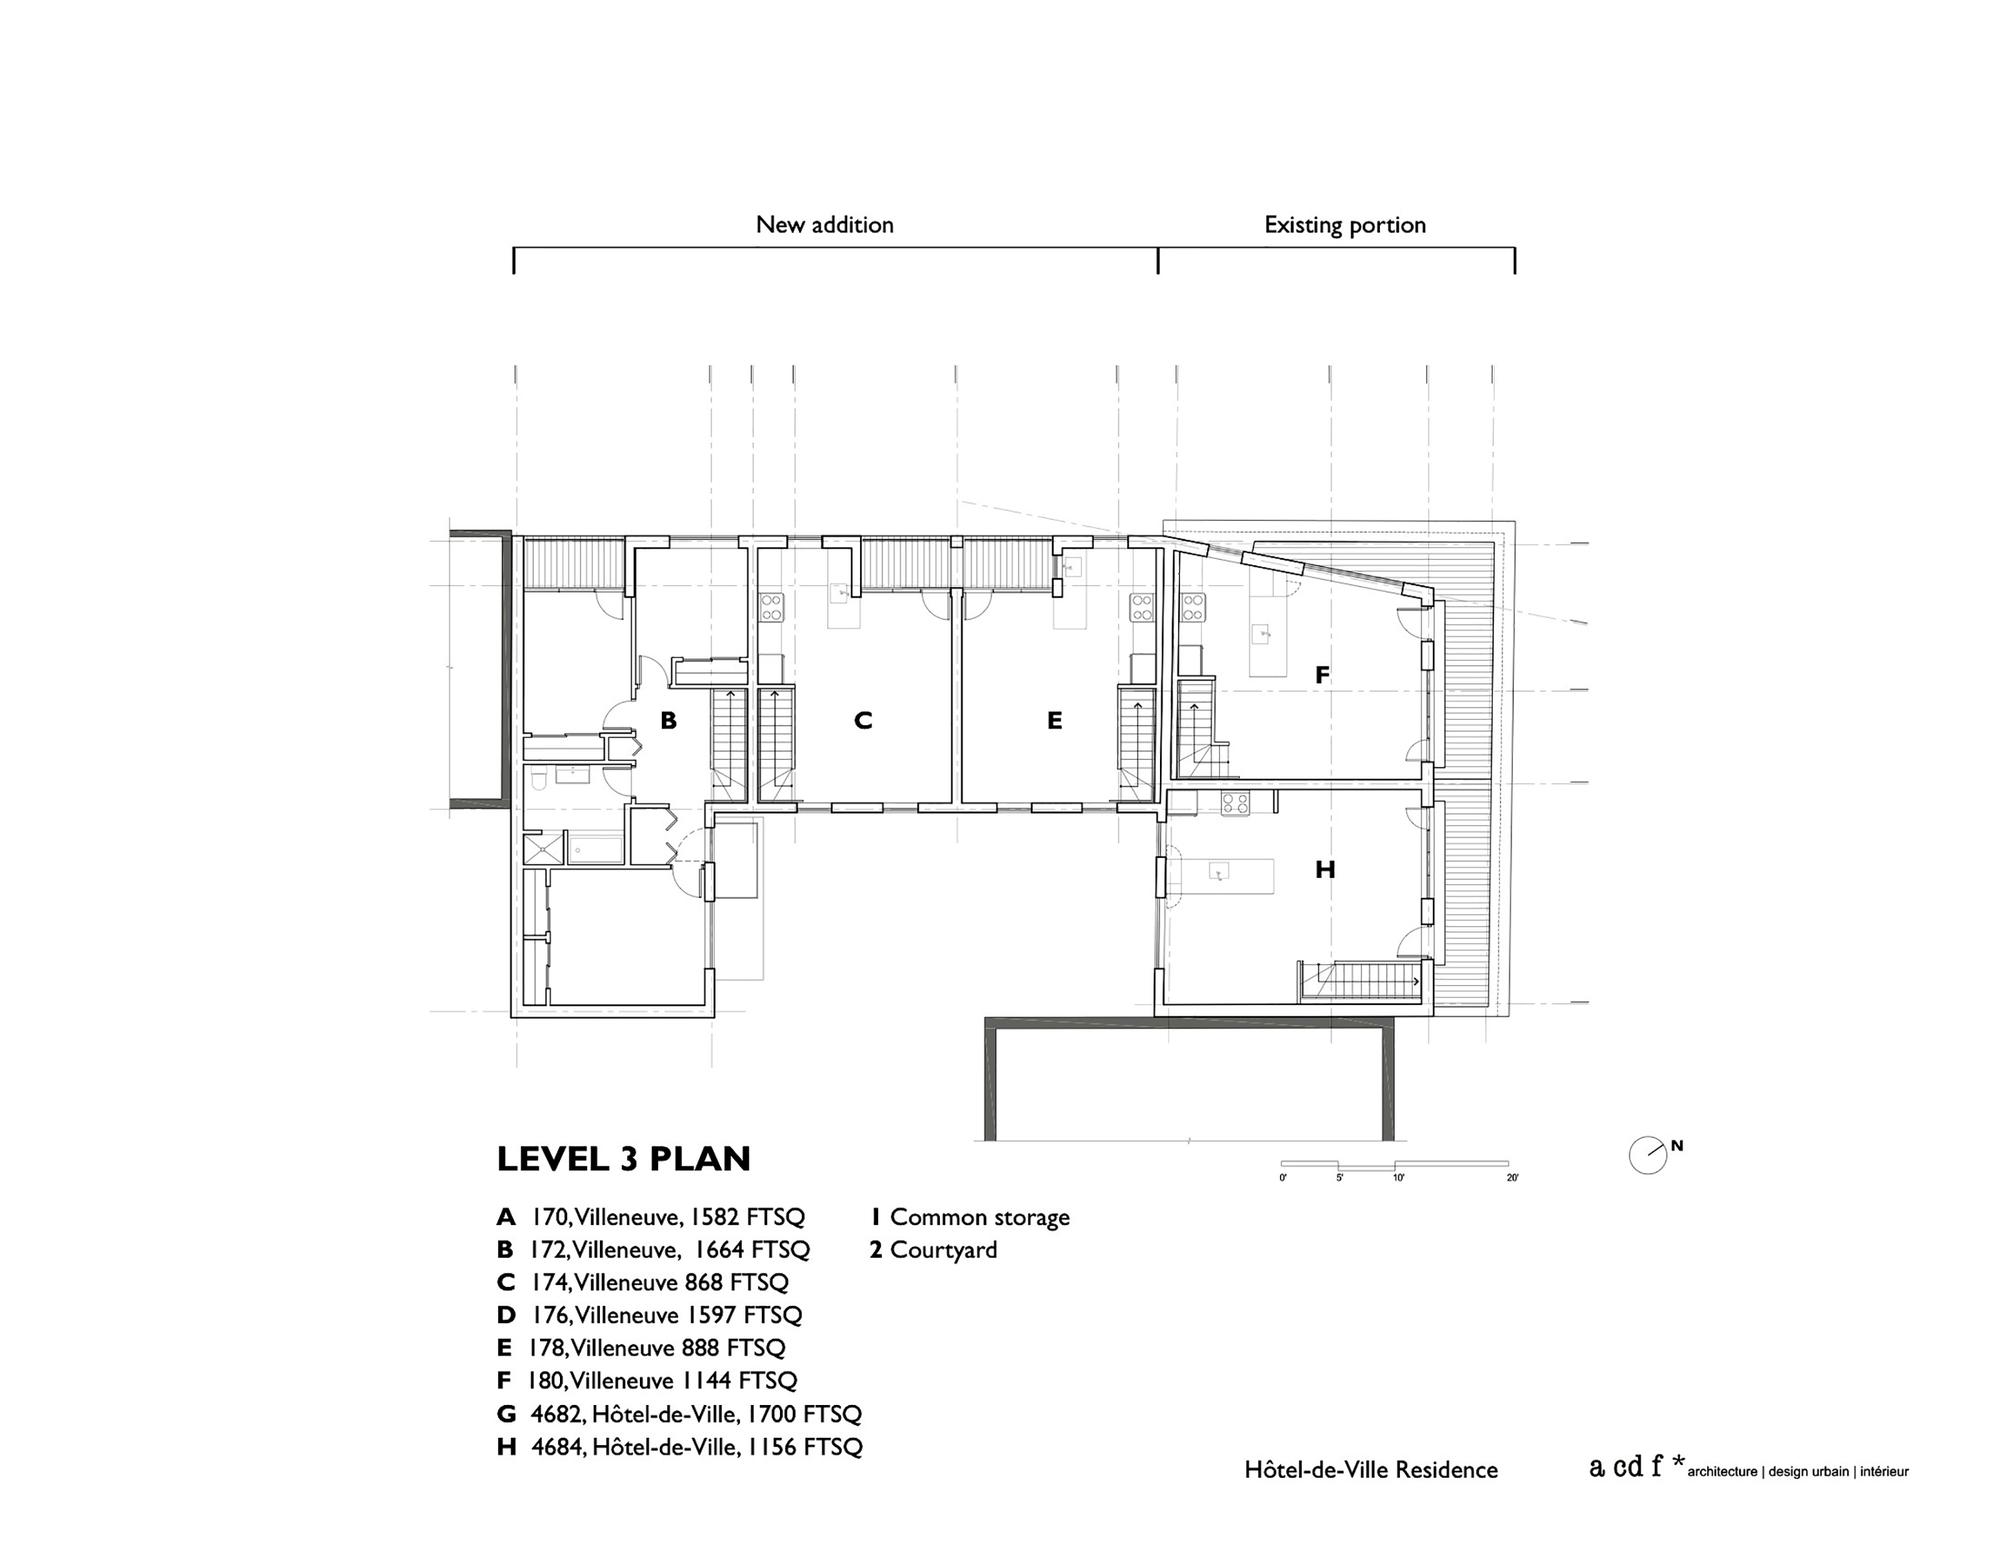 Galer a de residencia h tel de ville acdf architecture 12 for Acdf architecture